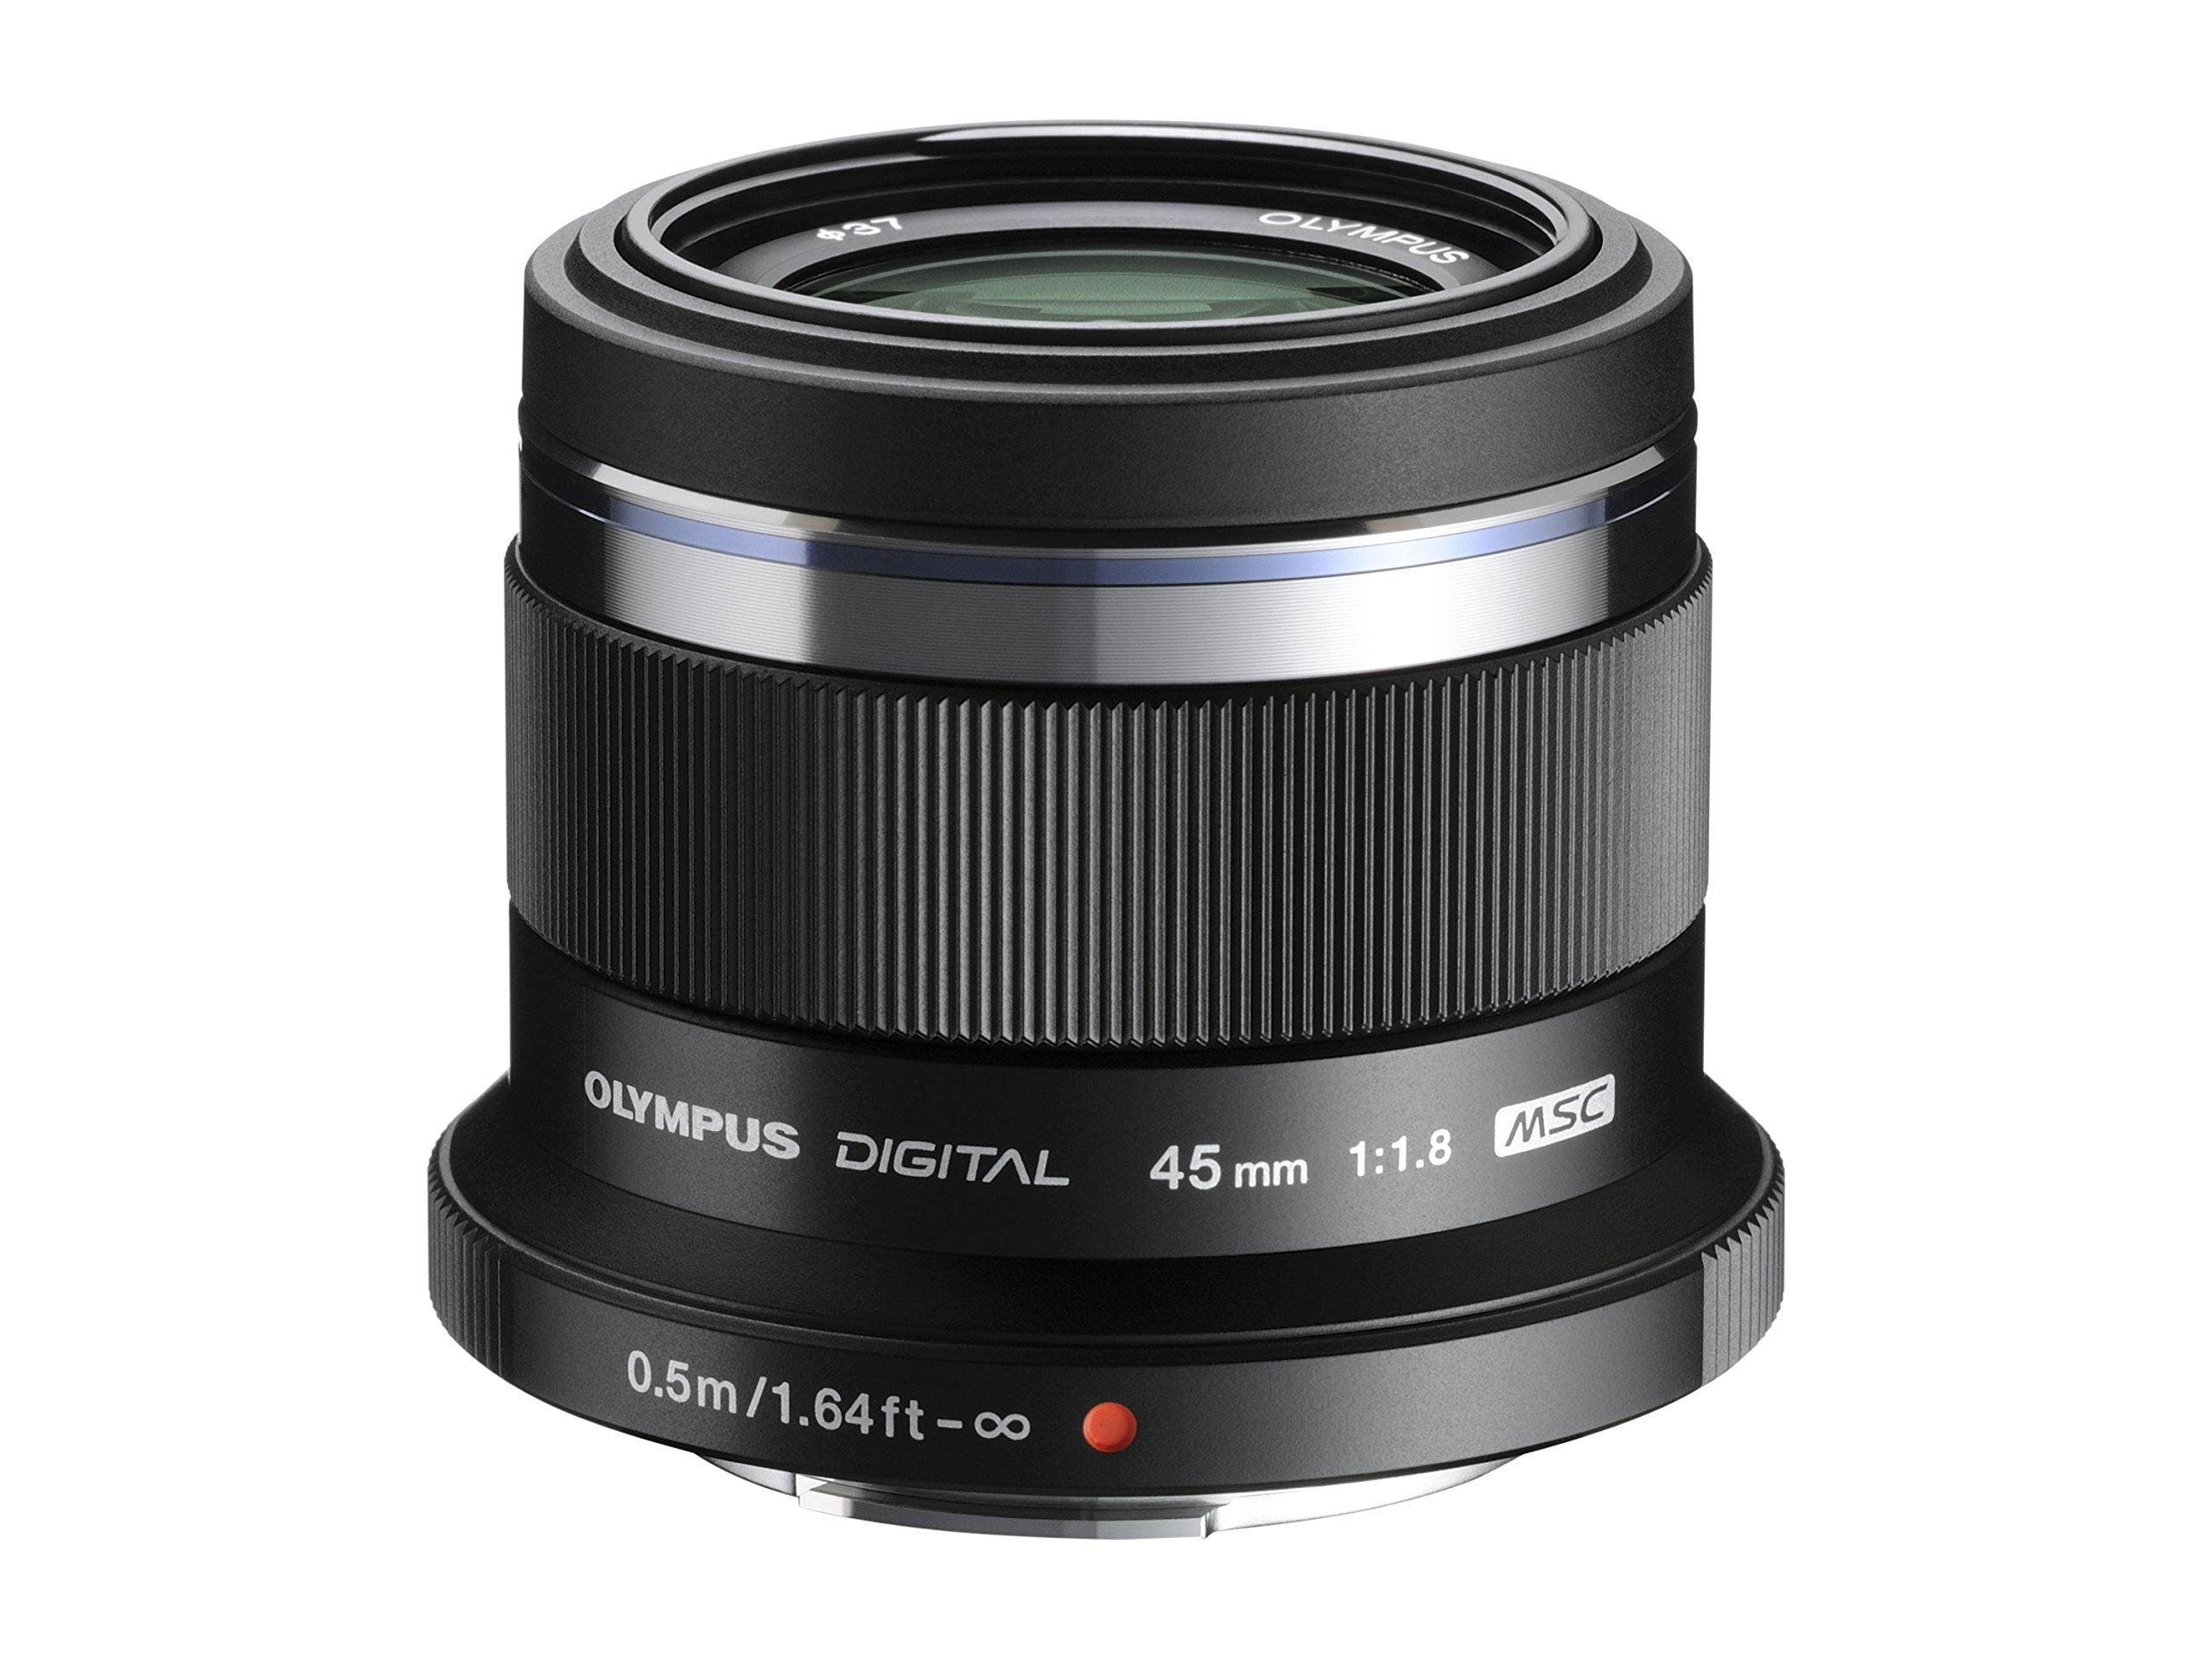 Olympus M. Zuiko Digital ED 45mm f1.8 (Black) Lens for Micro 4/3 Cameras - International Version (No Warranty) by Olympus